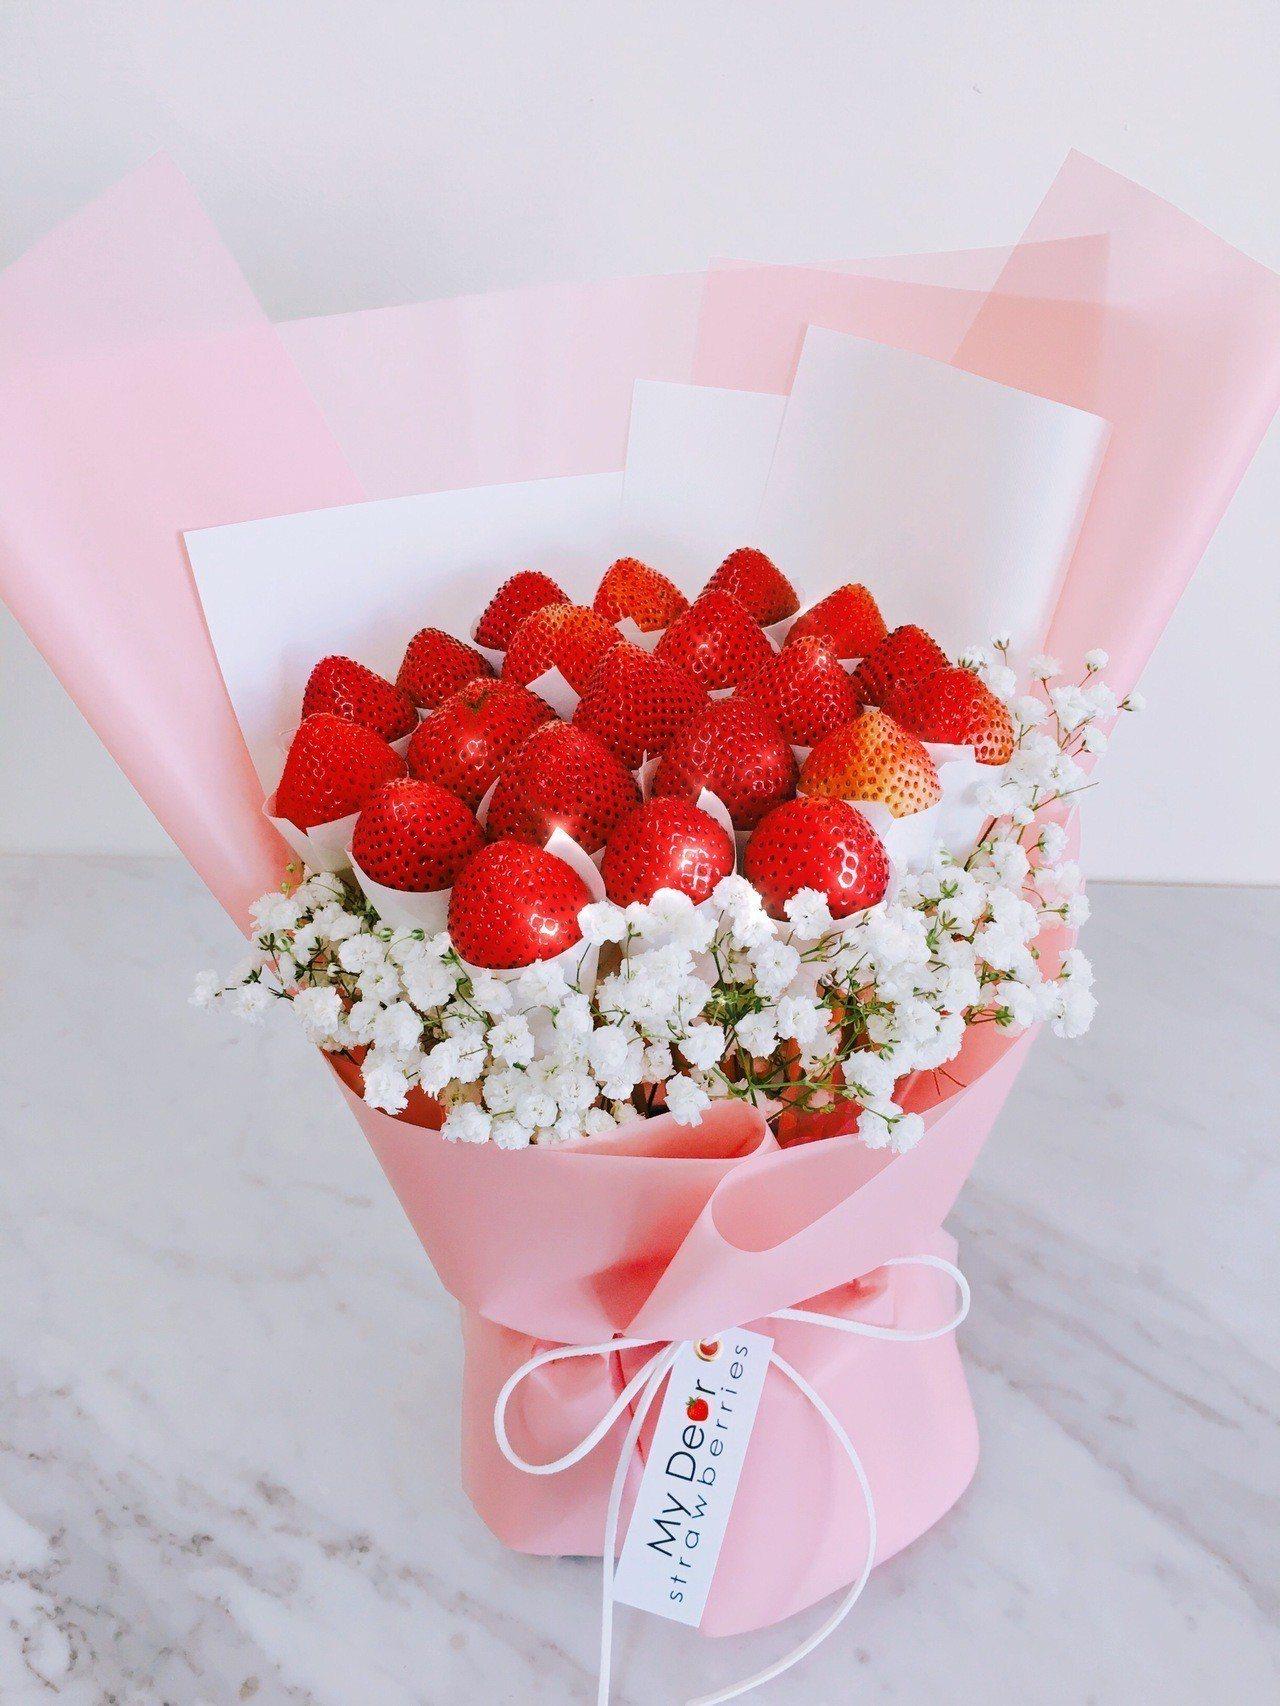 SOGO忠孝館耶誕市集,草莓花束Summer Love粉色禮盒組原價2,699元...